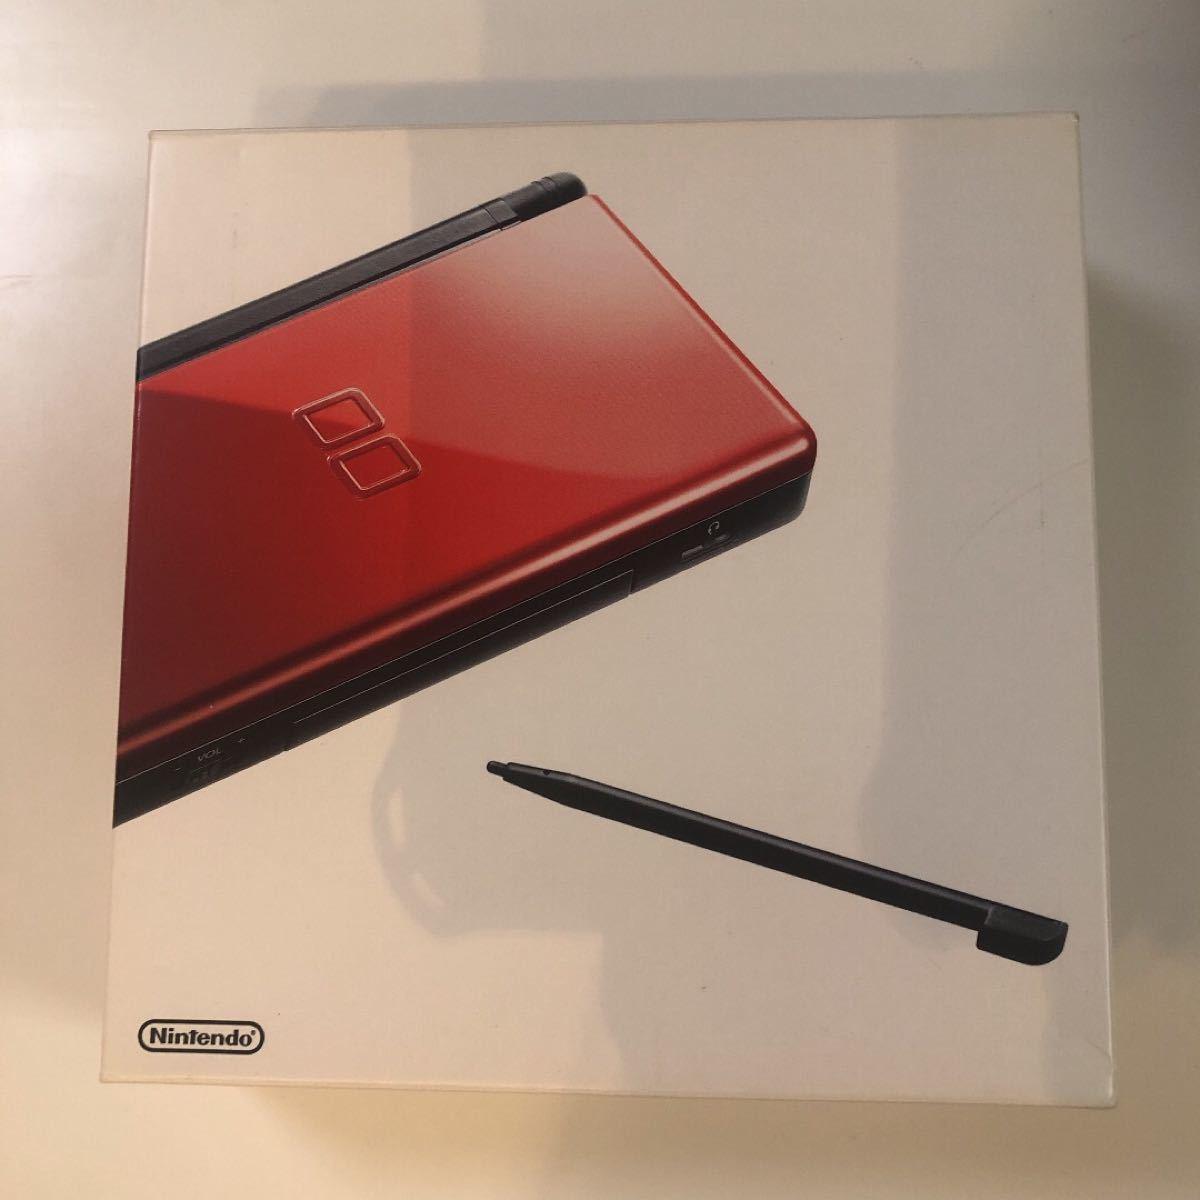 Nintendo NINTENDO DS ニンテンドーDS LITE クリムゾン、ブラック